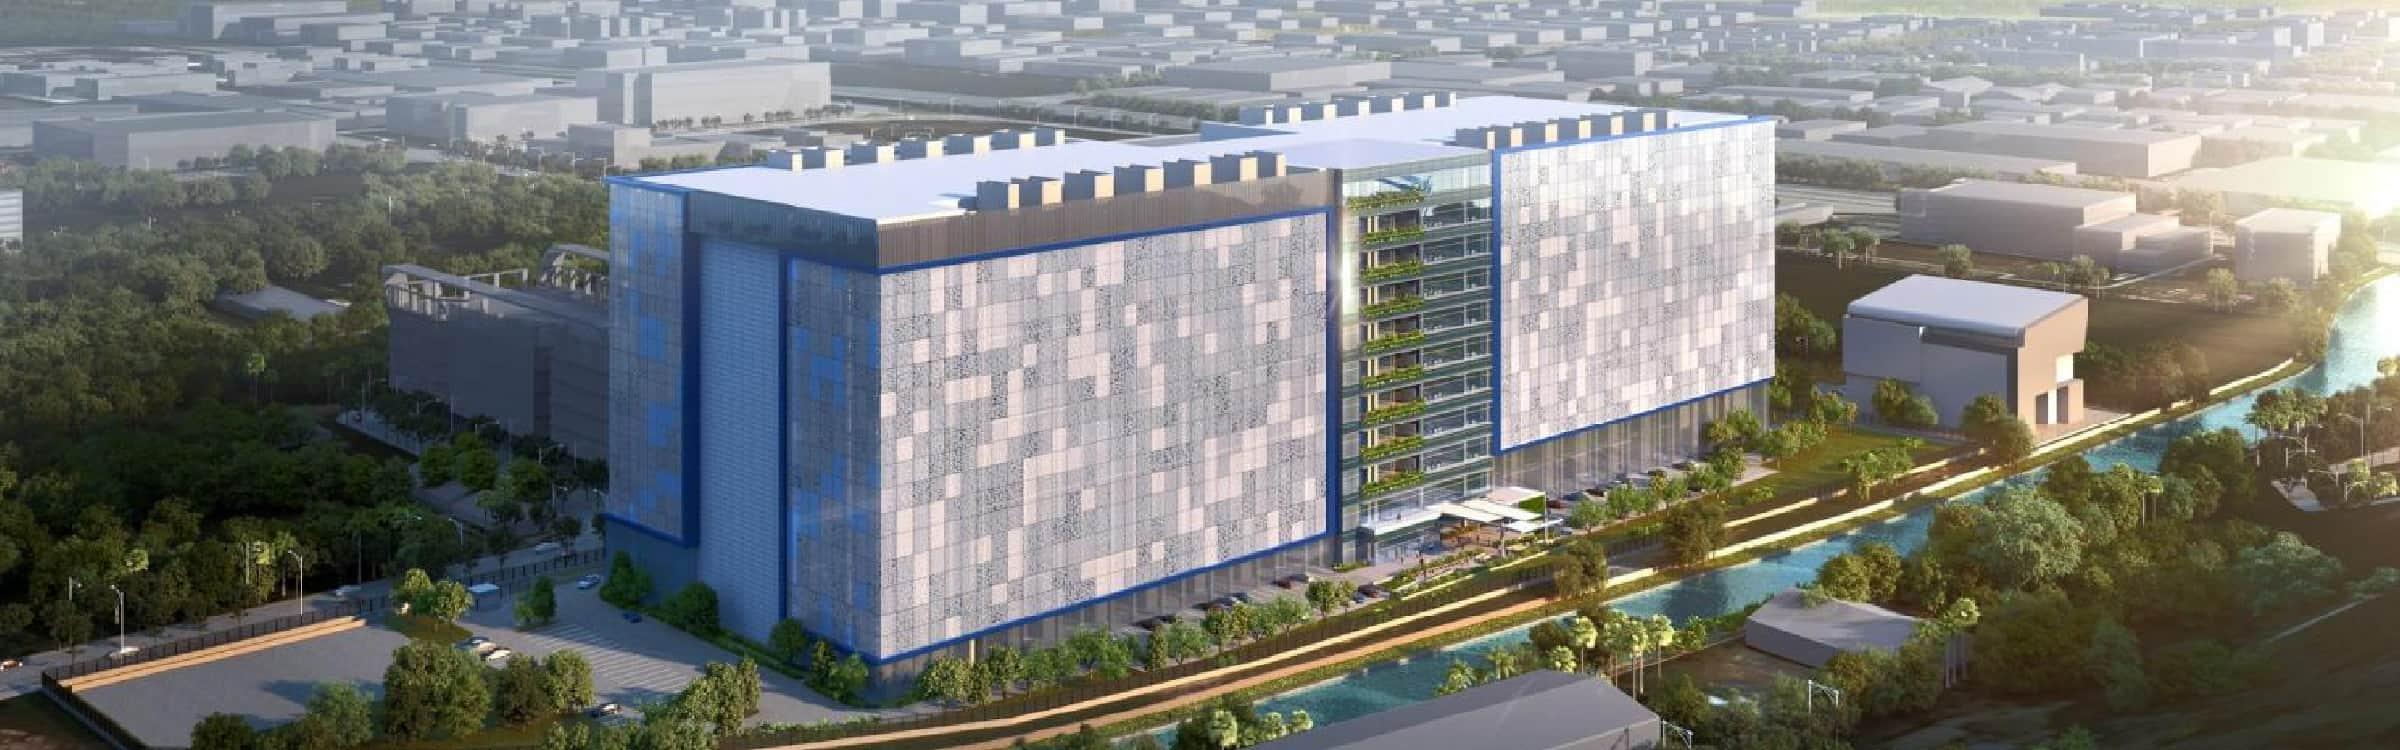 Microsoft-Data-Centre-Singapore-2400-x-750